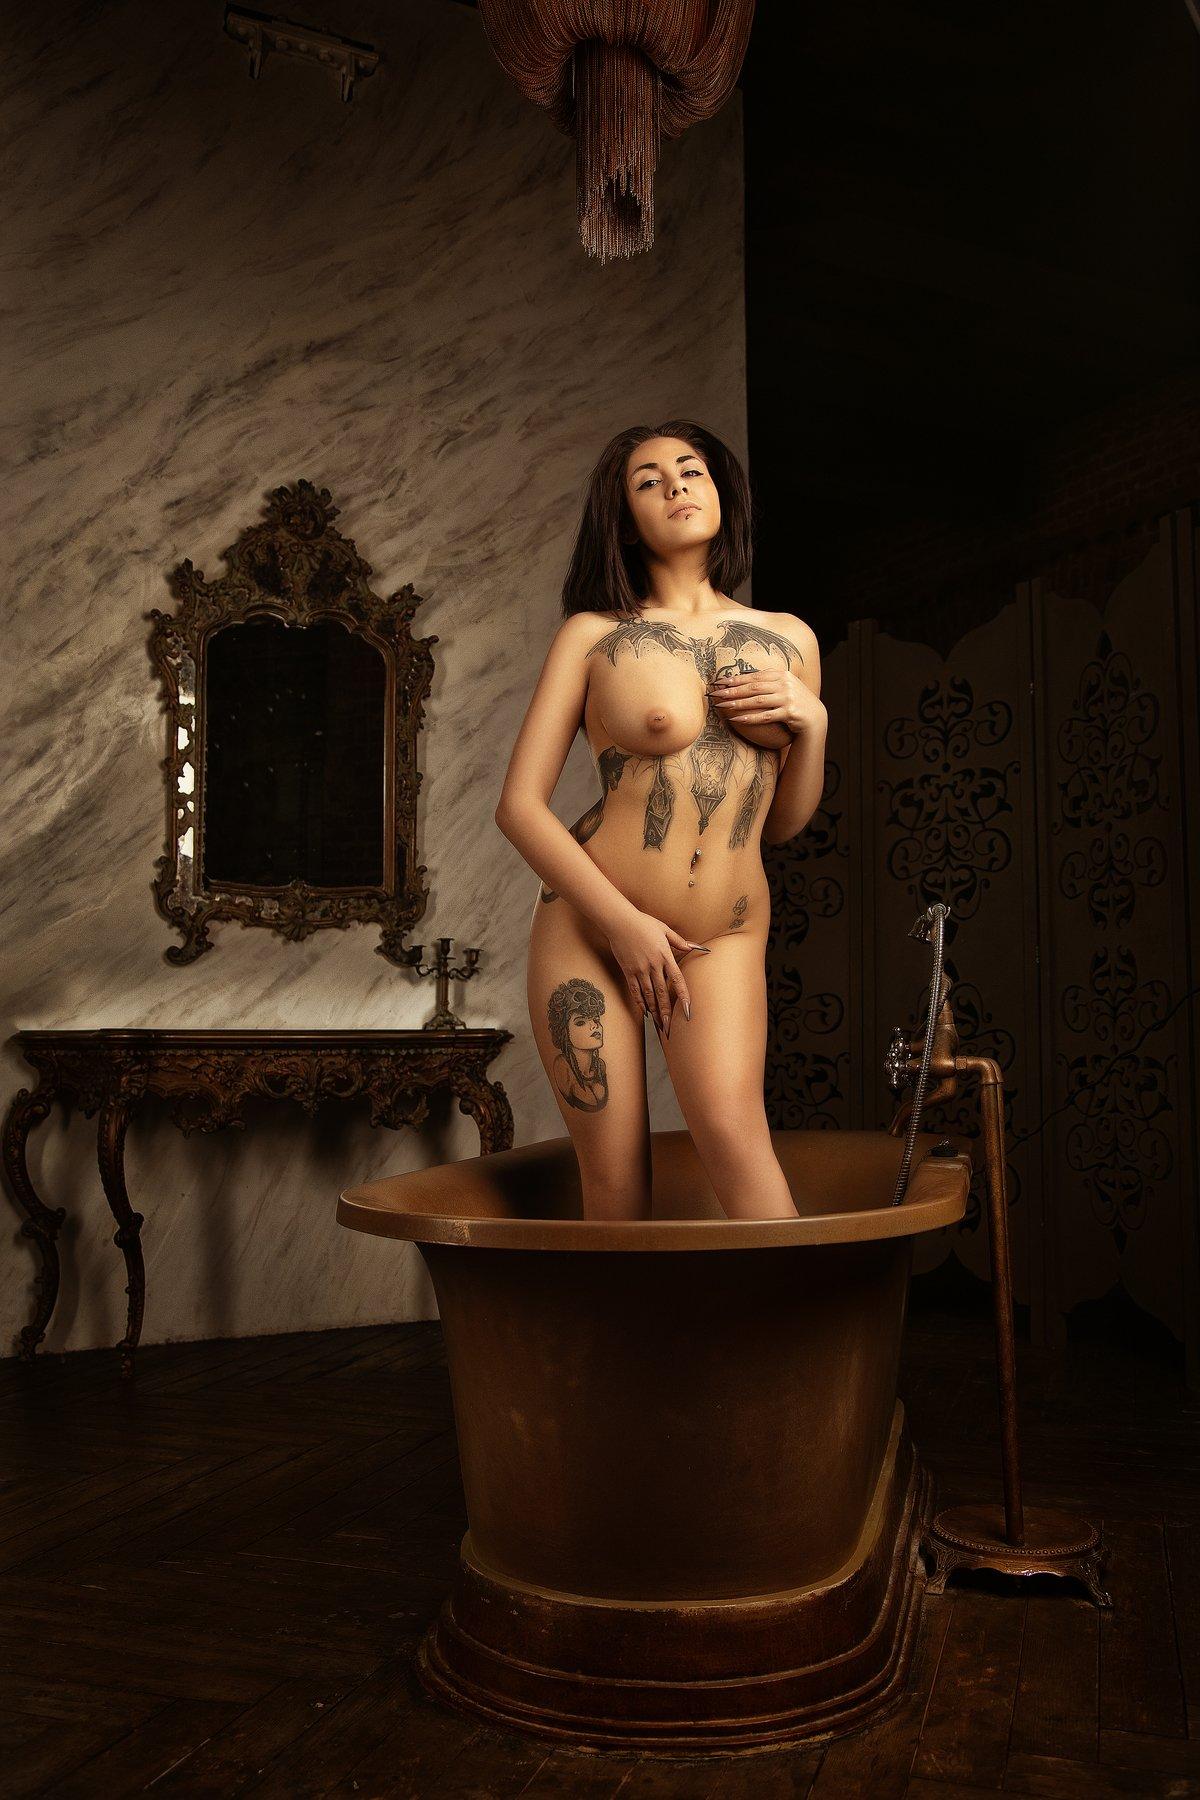 washnude,эротика, красотки, erotic,beautiful, эротика,красотка ,pretty, Сергей Мелефара